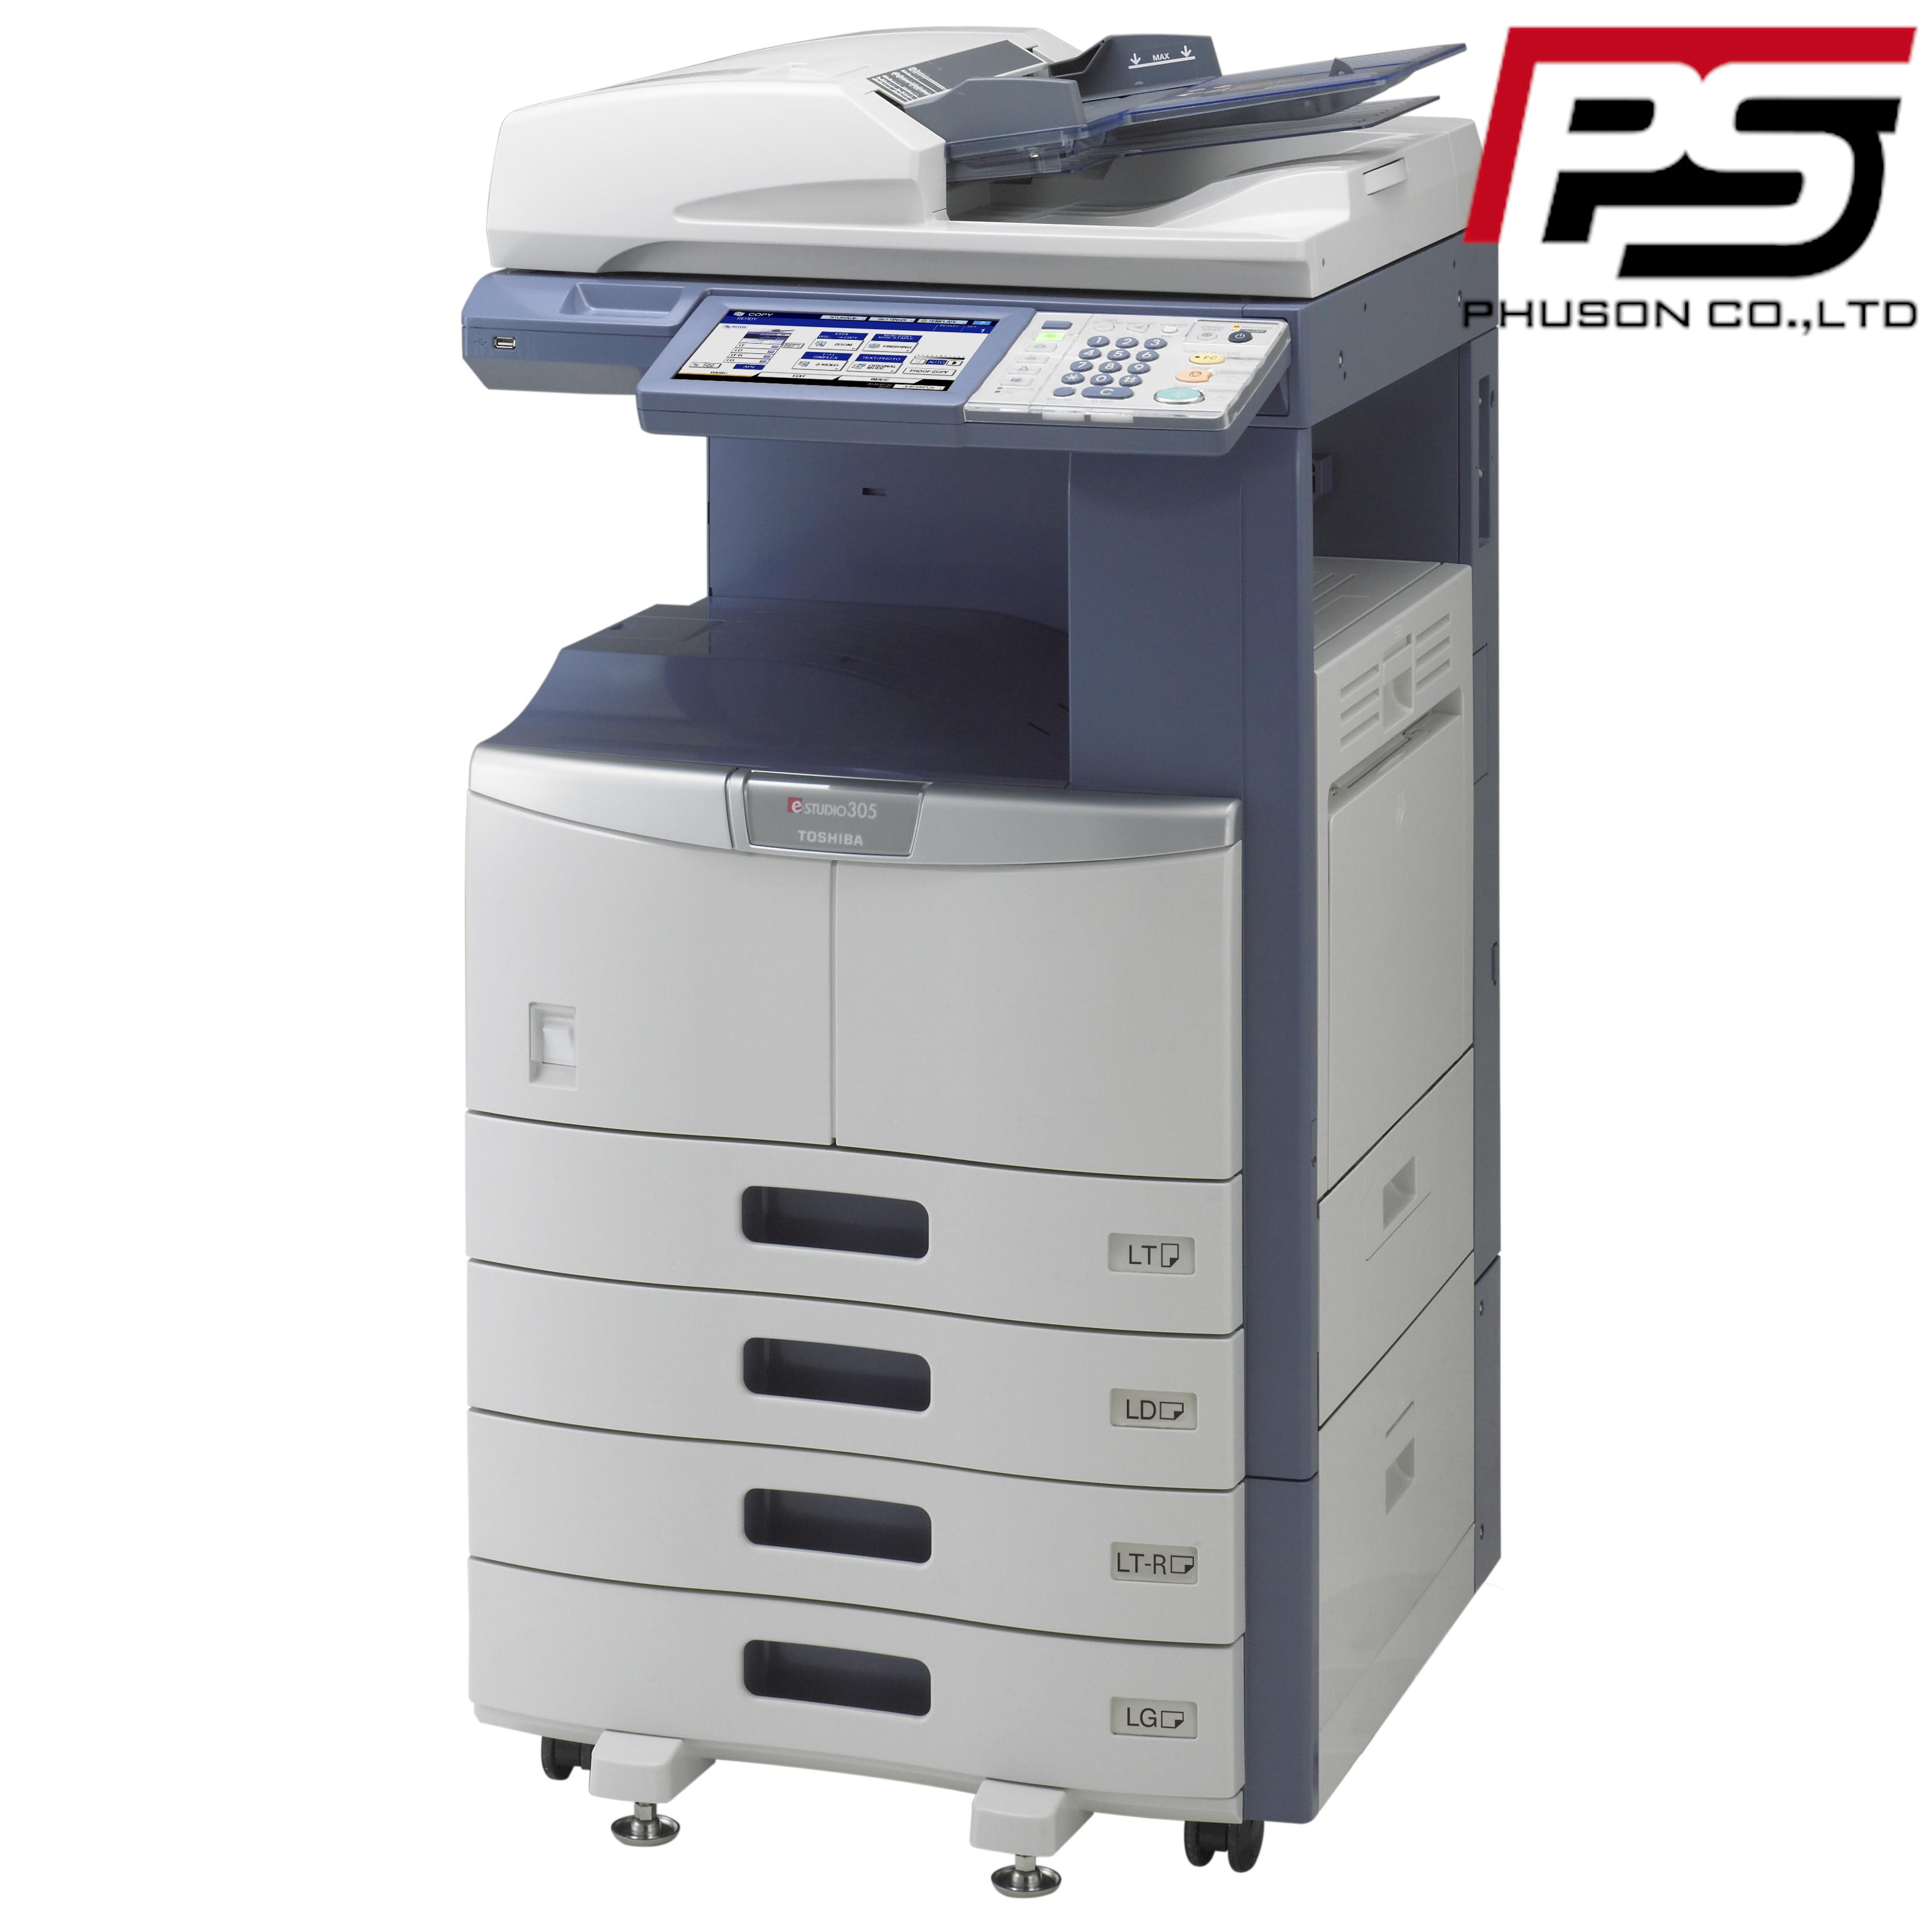 Thuê máy Photocopy Toshiba e-Studio 305